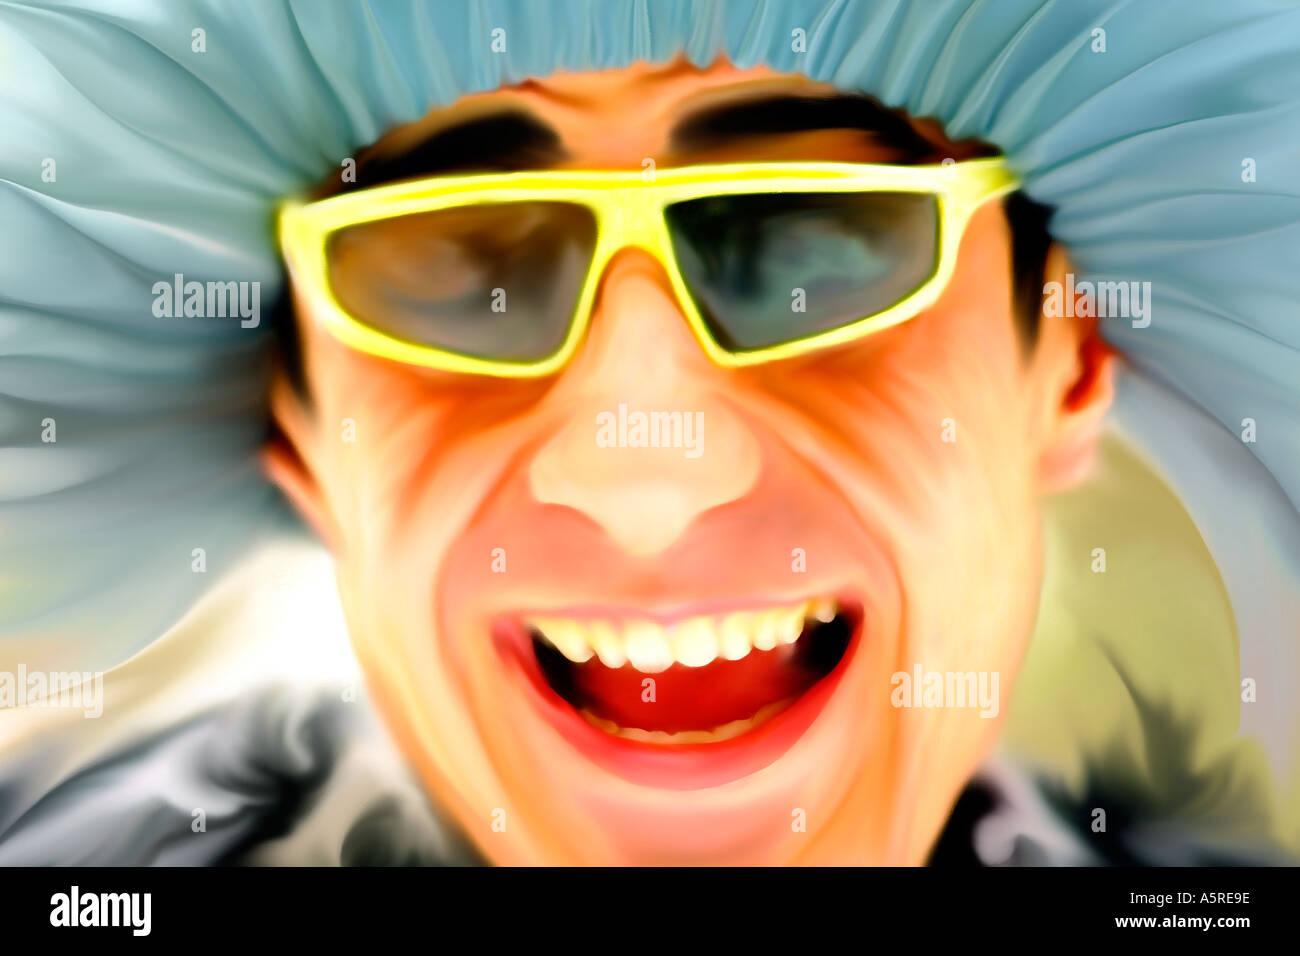 Funny portrait - Stock Image